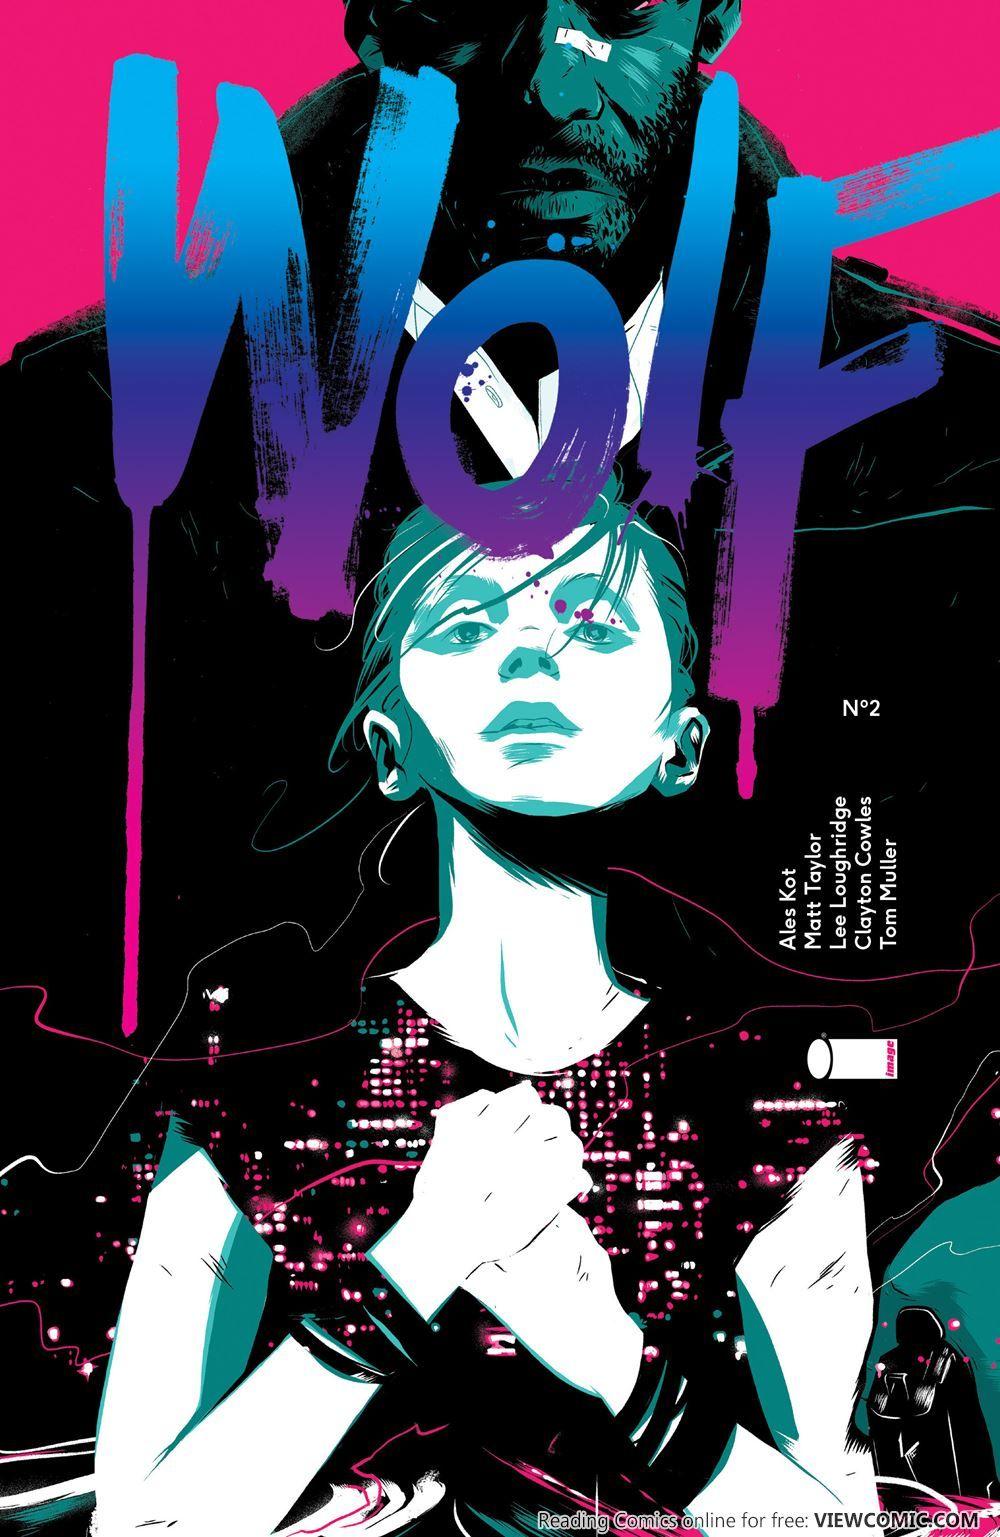 Wolf 002 (2015) ………… ………………………… | View Comic | Comic Books I